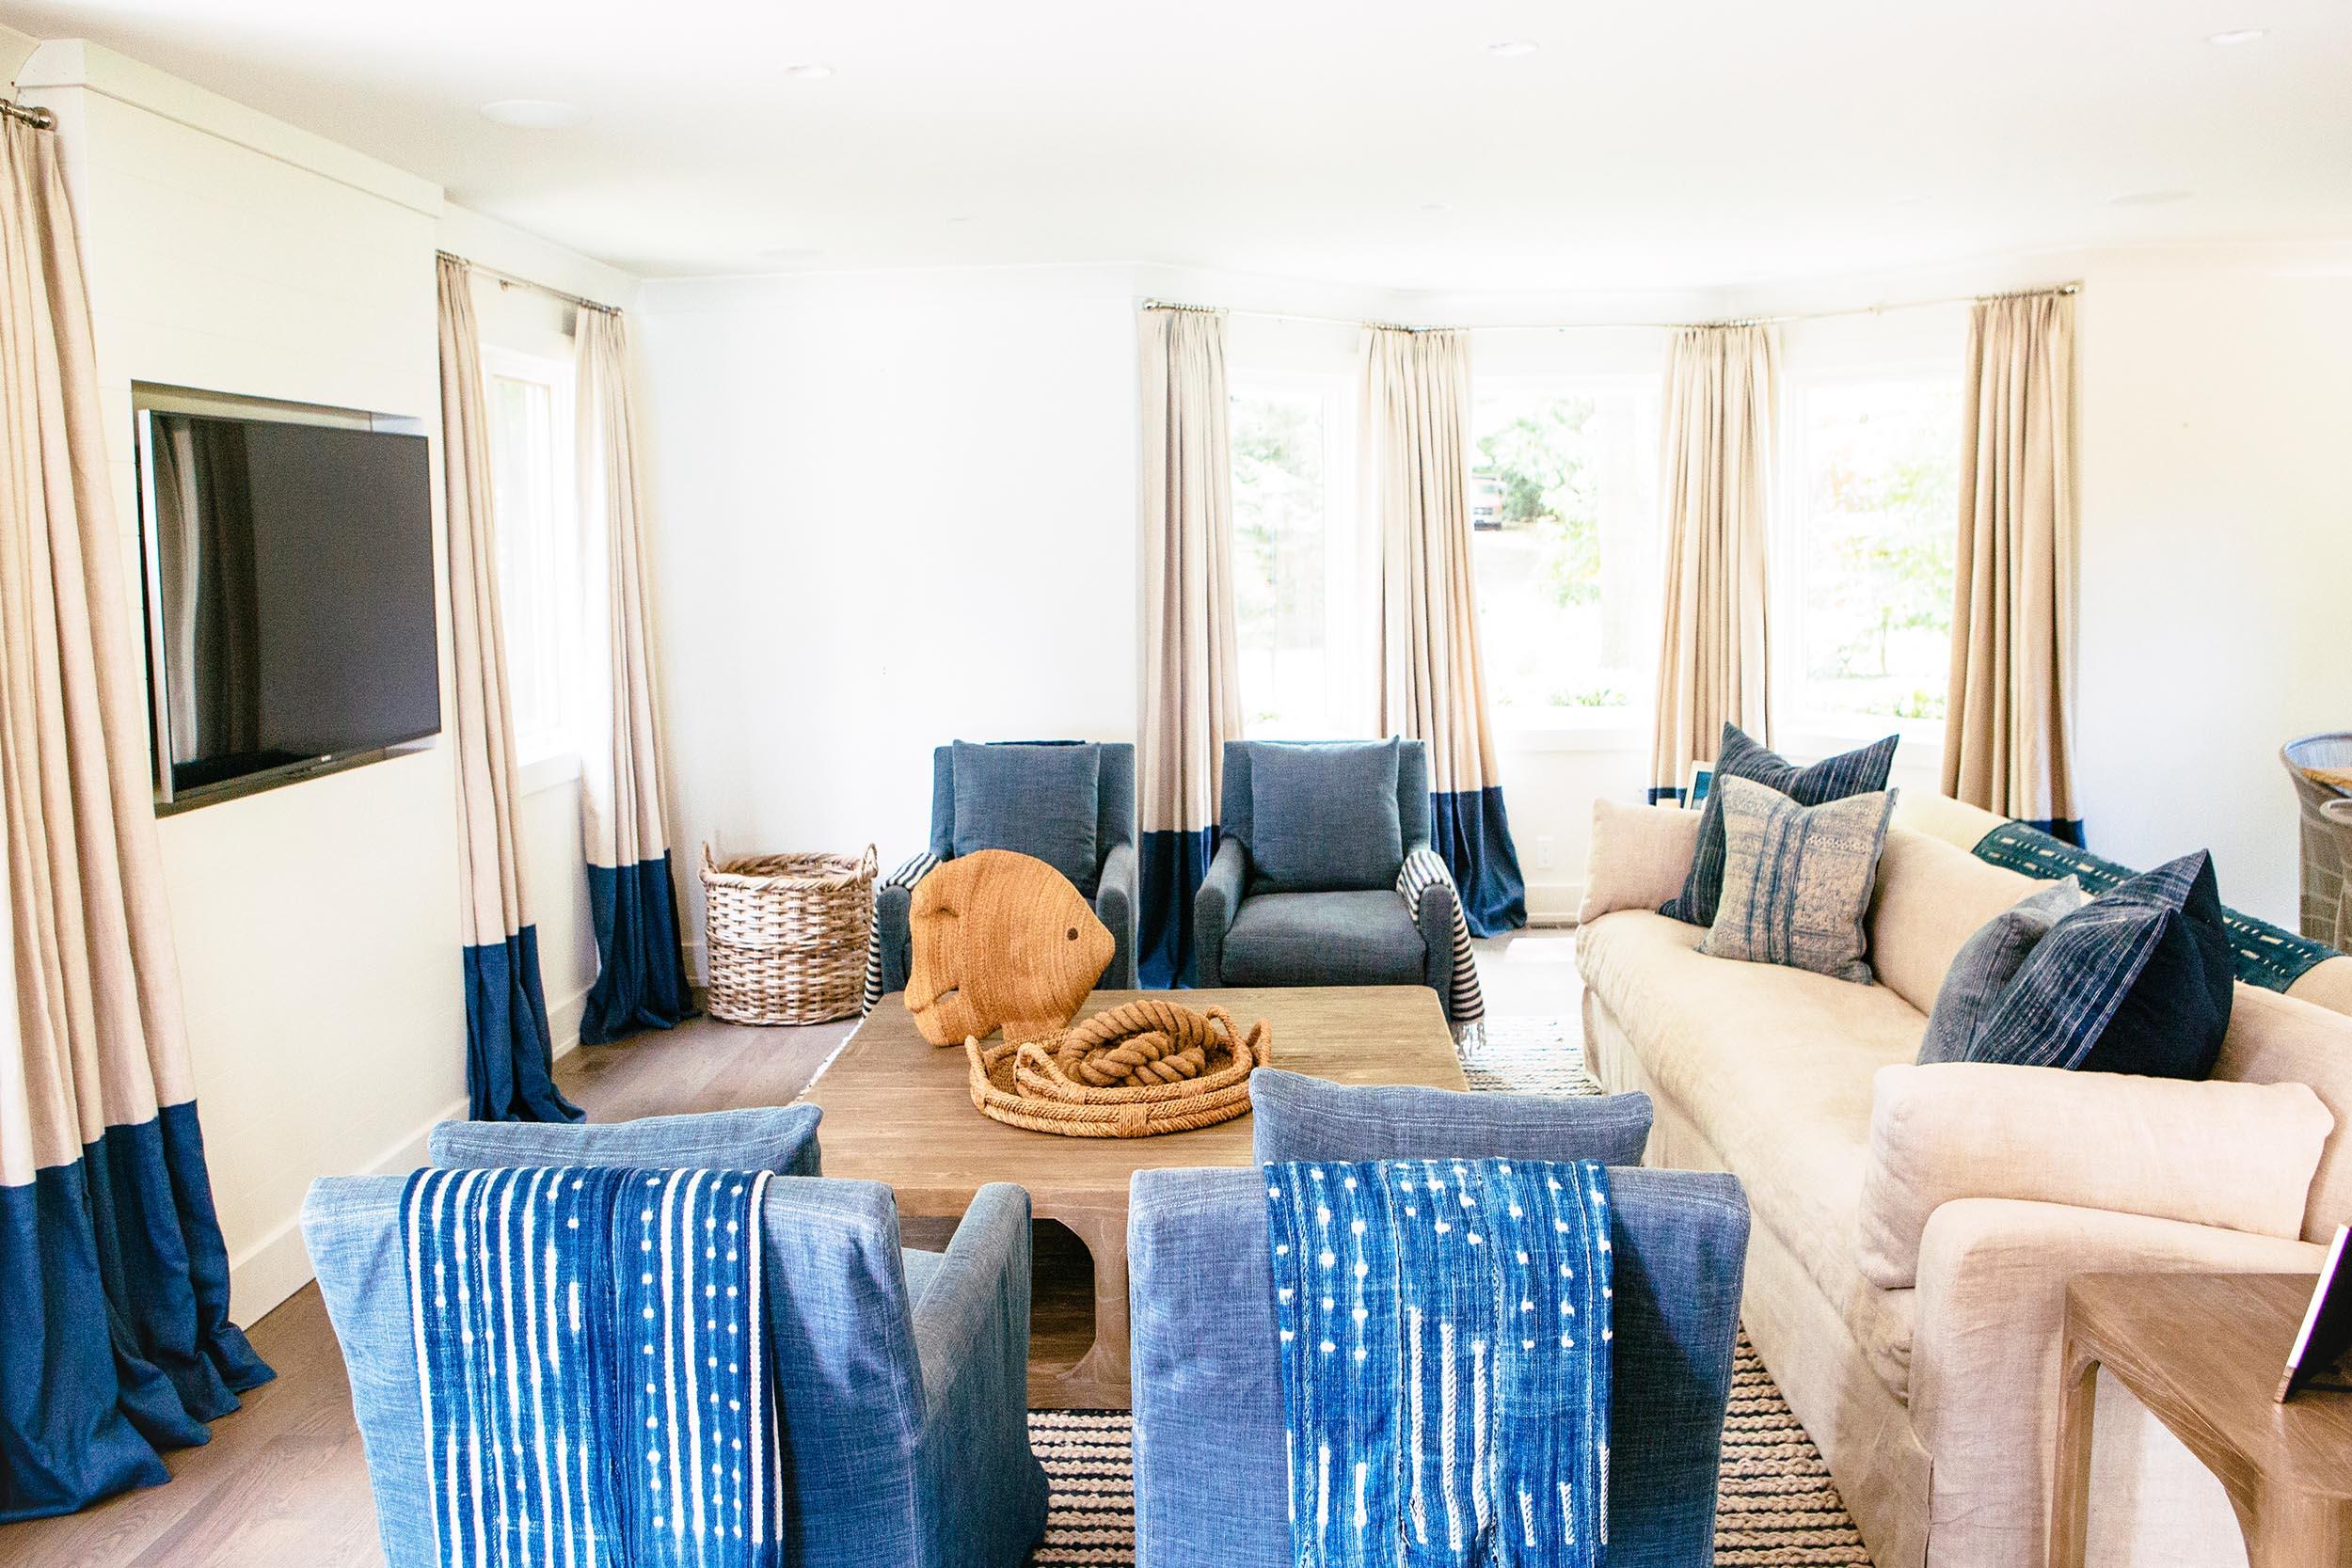 Leo_Designs_Chicago_interior_design_indigo_dreams_beach_house2.jpg